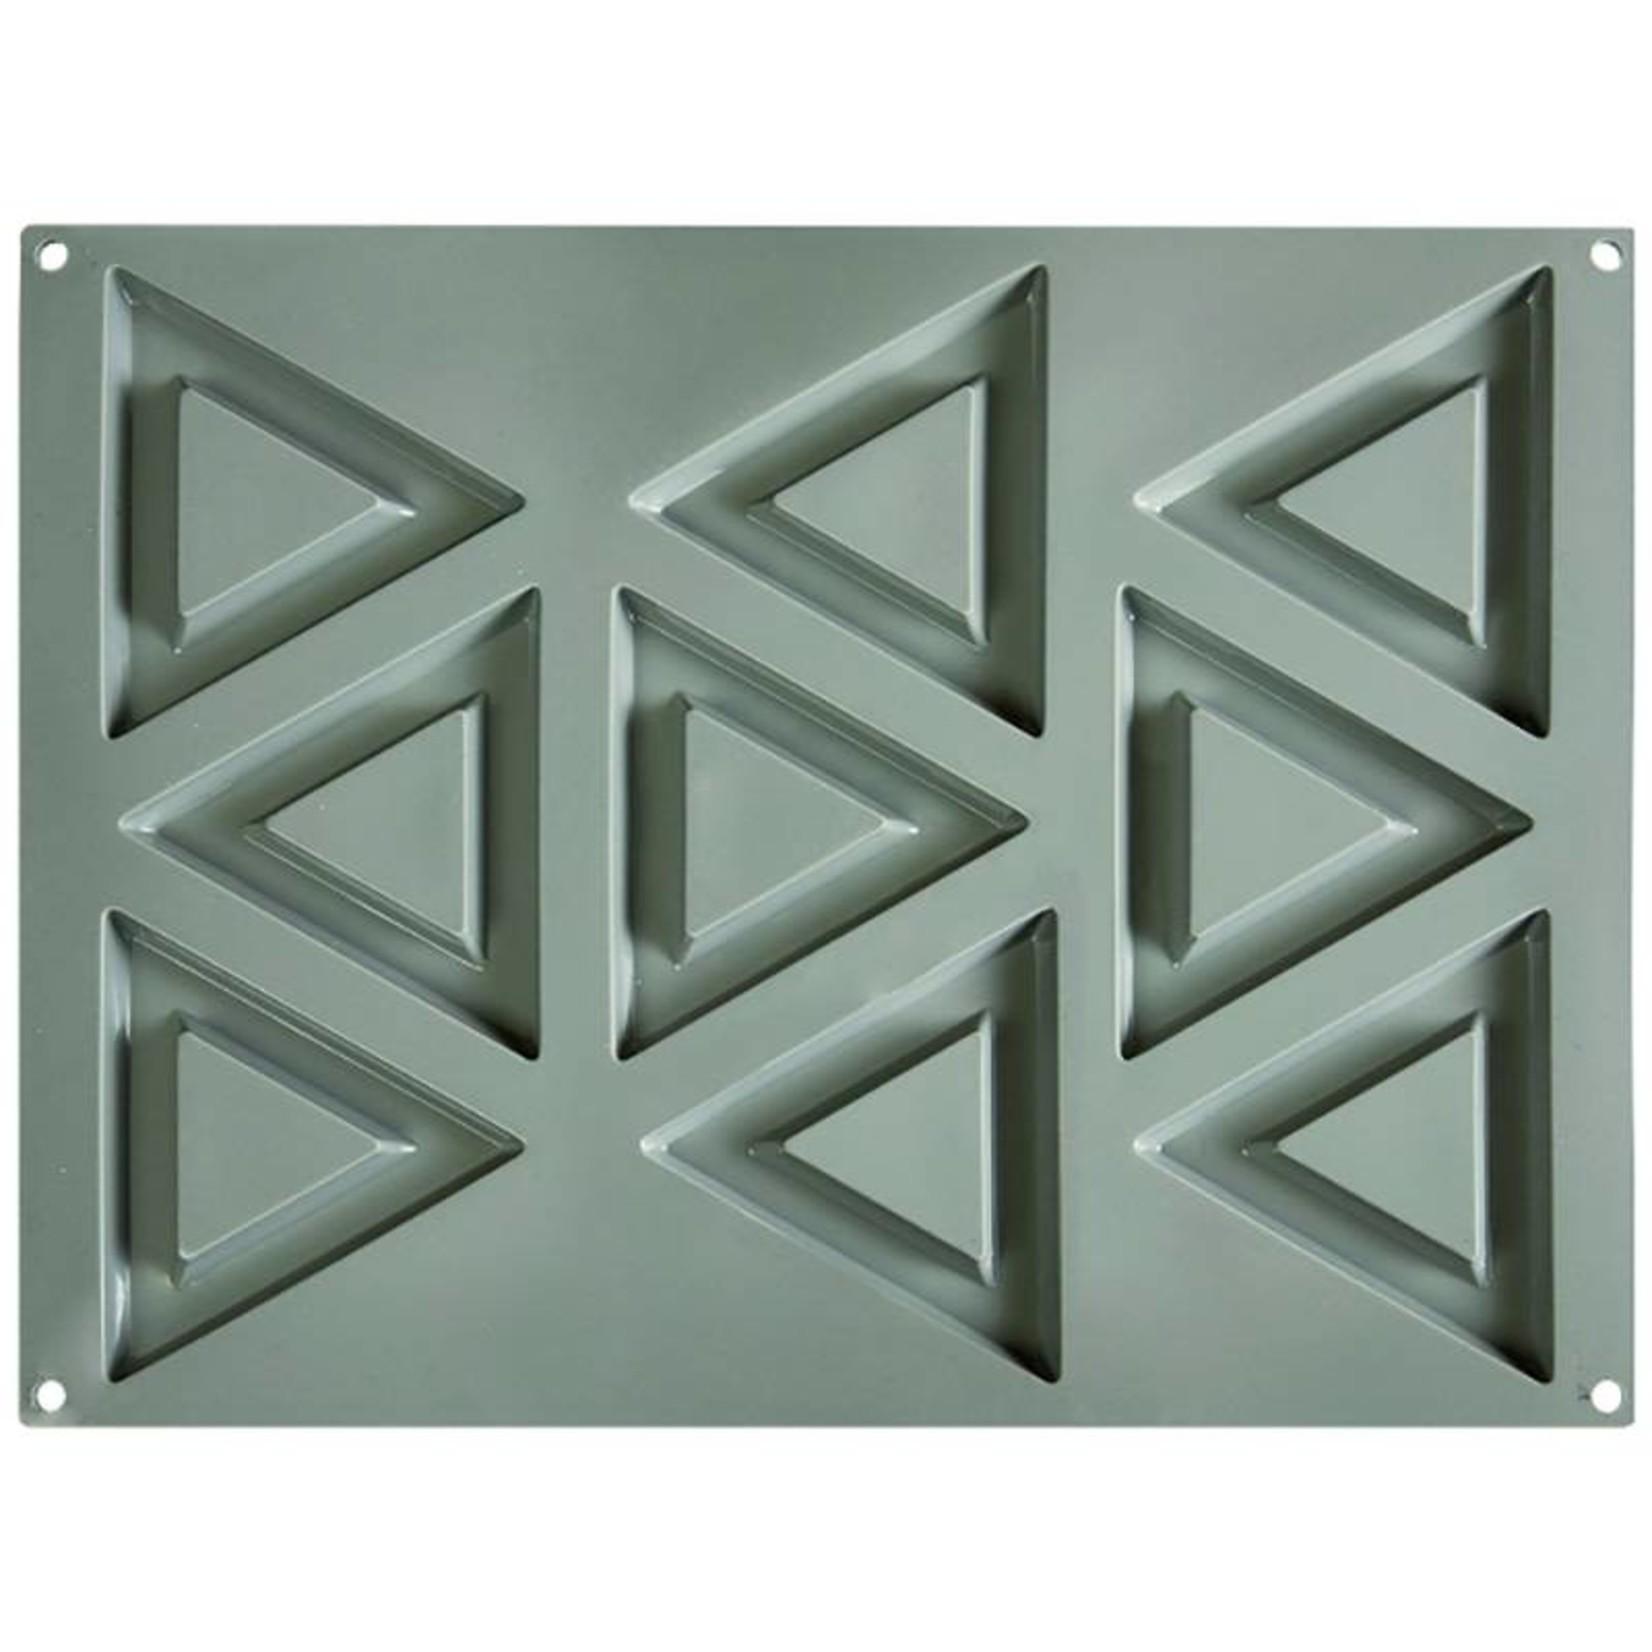 Pavoni Pavoni - Gourmand silicone mold, Triangolo (9 cavity), GG008